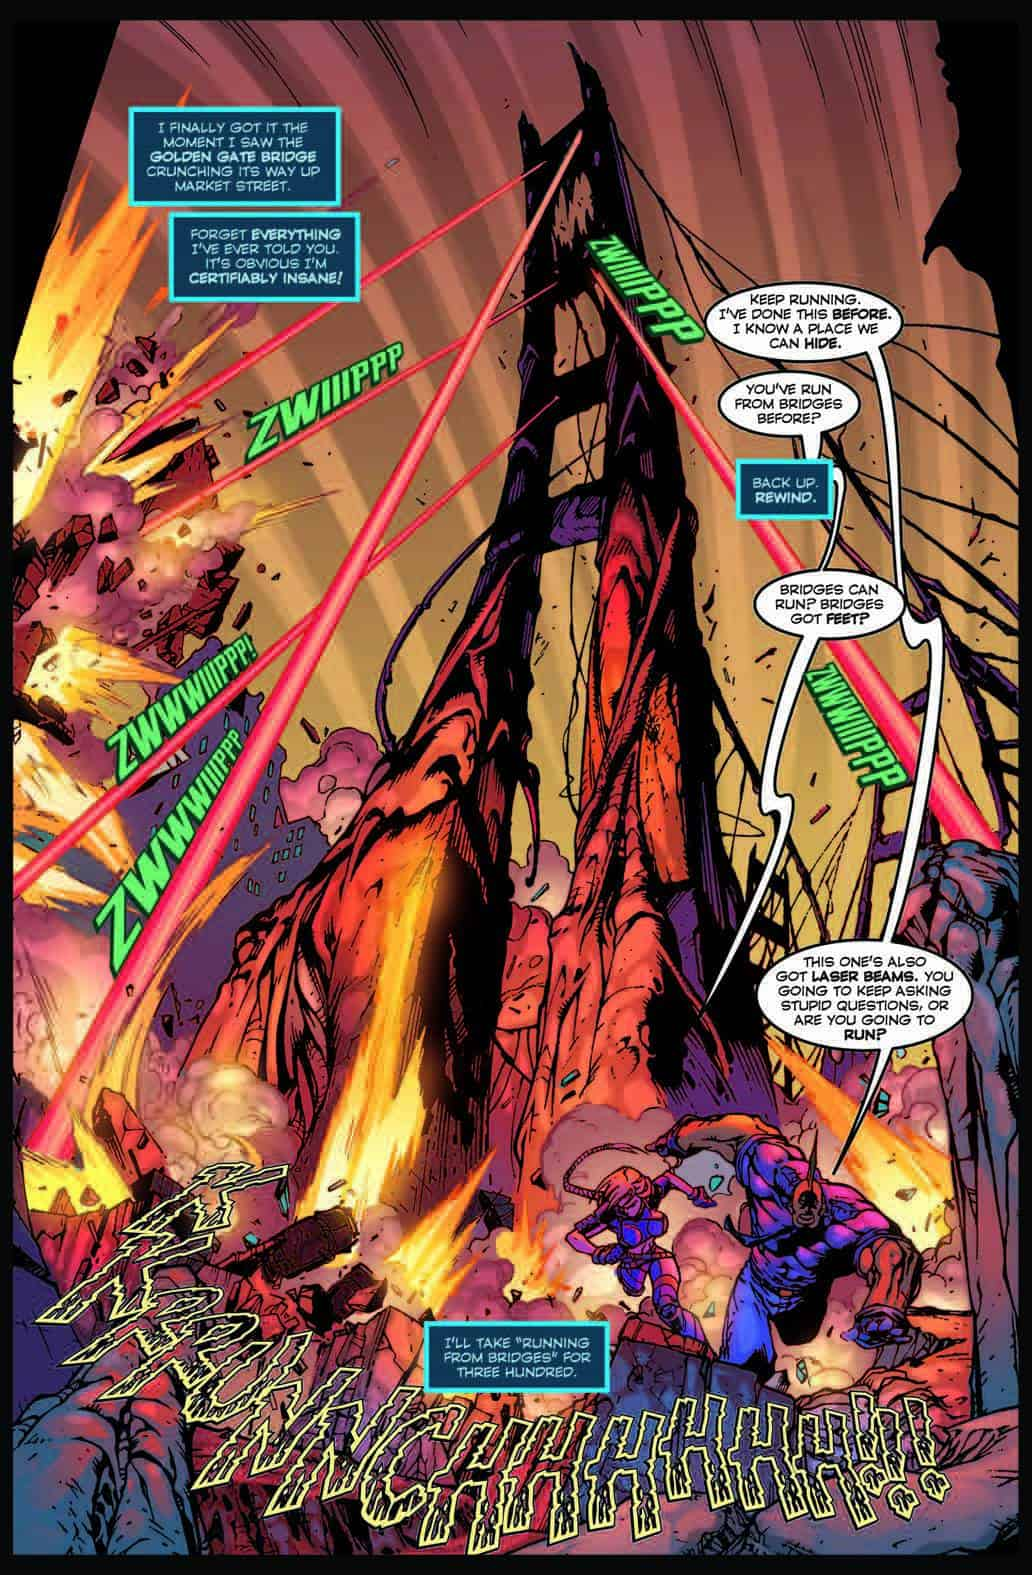 10th-Muse-Vol-2-the-Image-Comics-Run-Part-2-Image-05